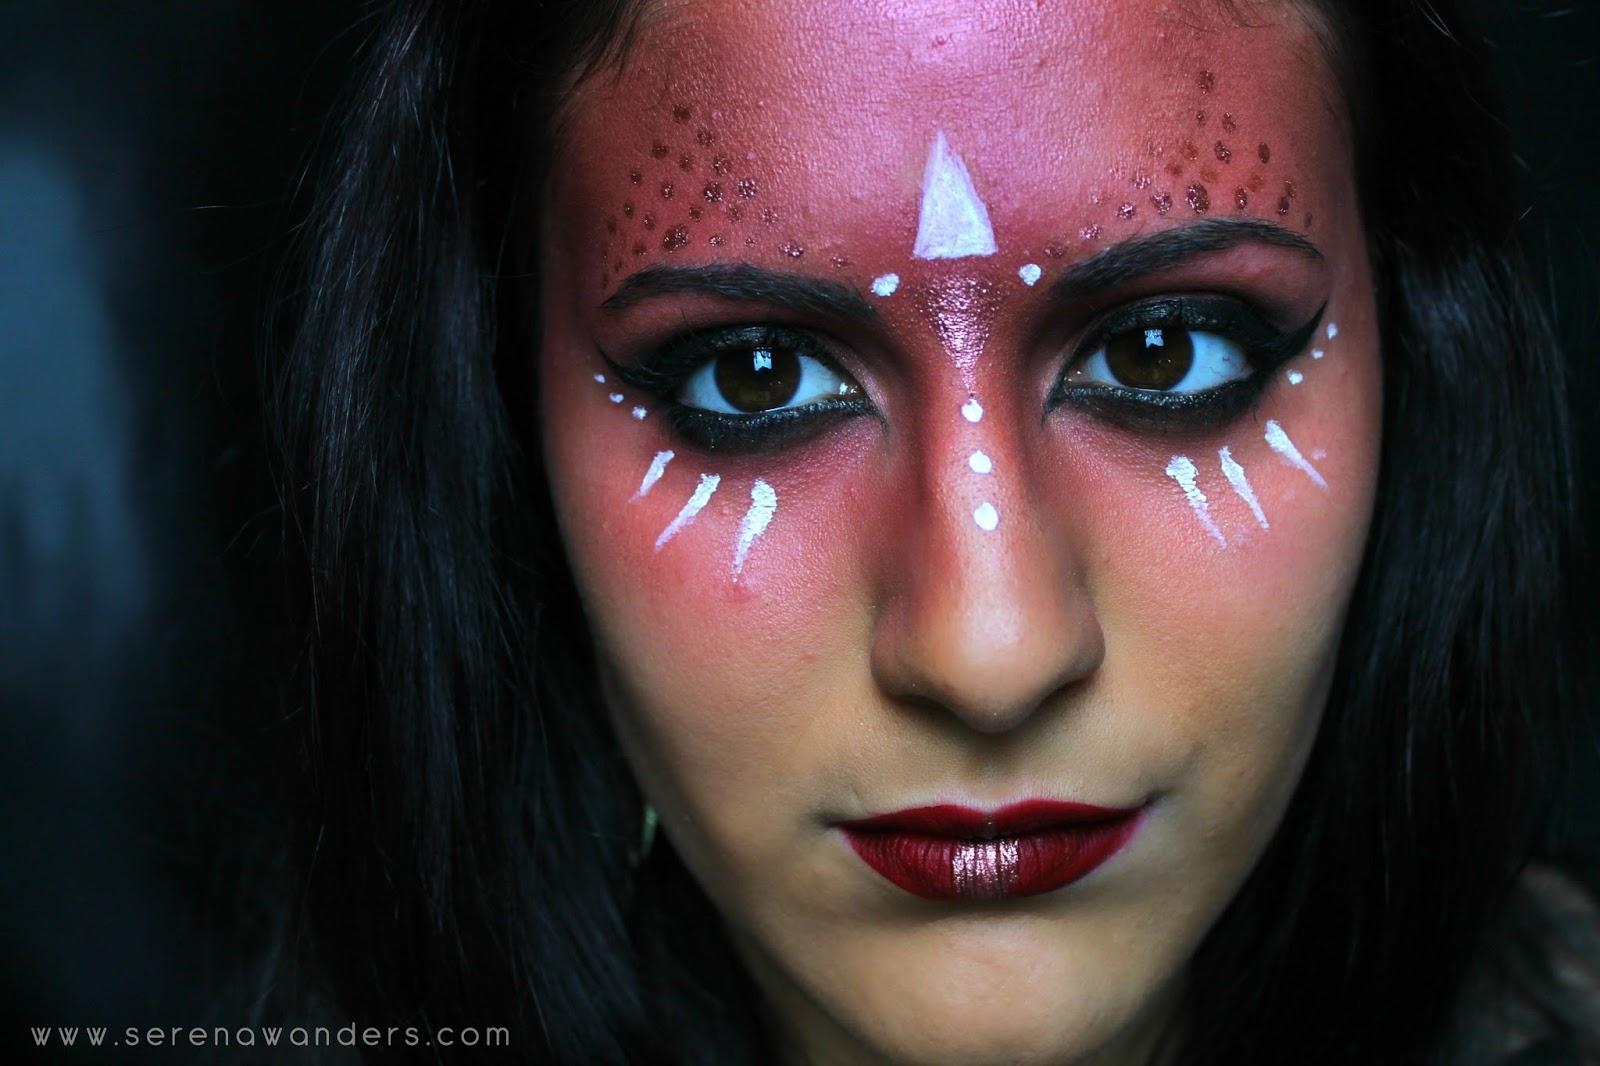 abbastanza Serena Wanders: FREE SPIRIT Makeup Tutorial | NYX Face Awards  DL76